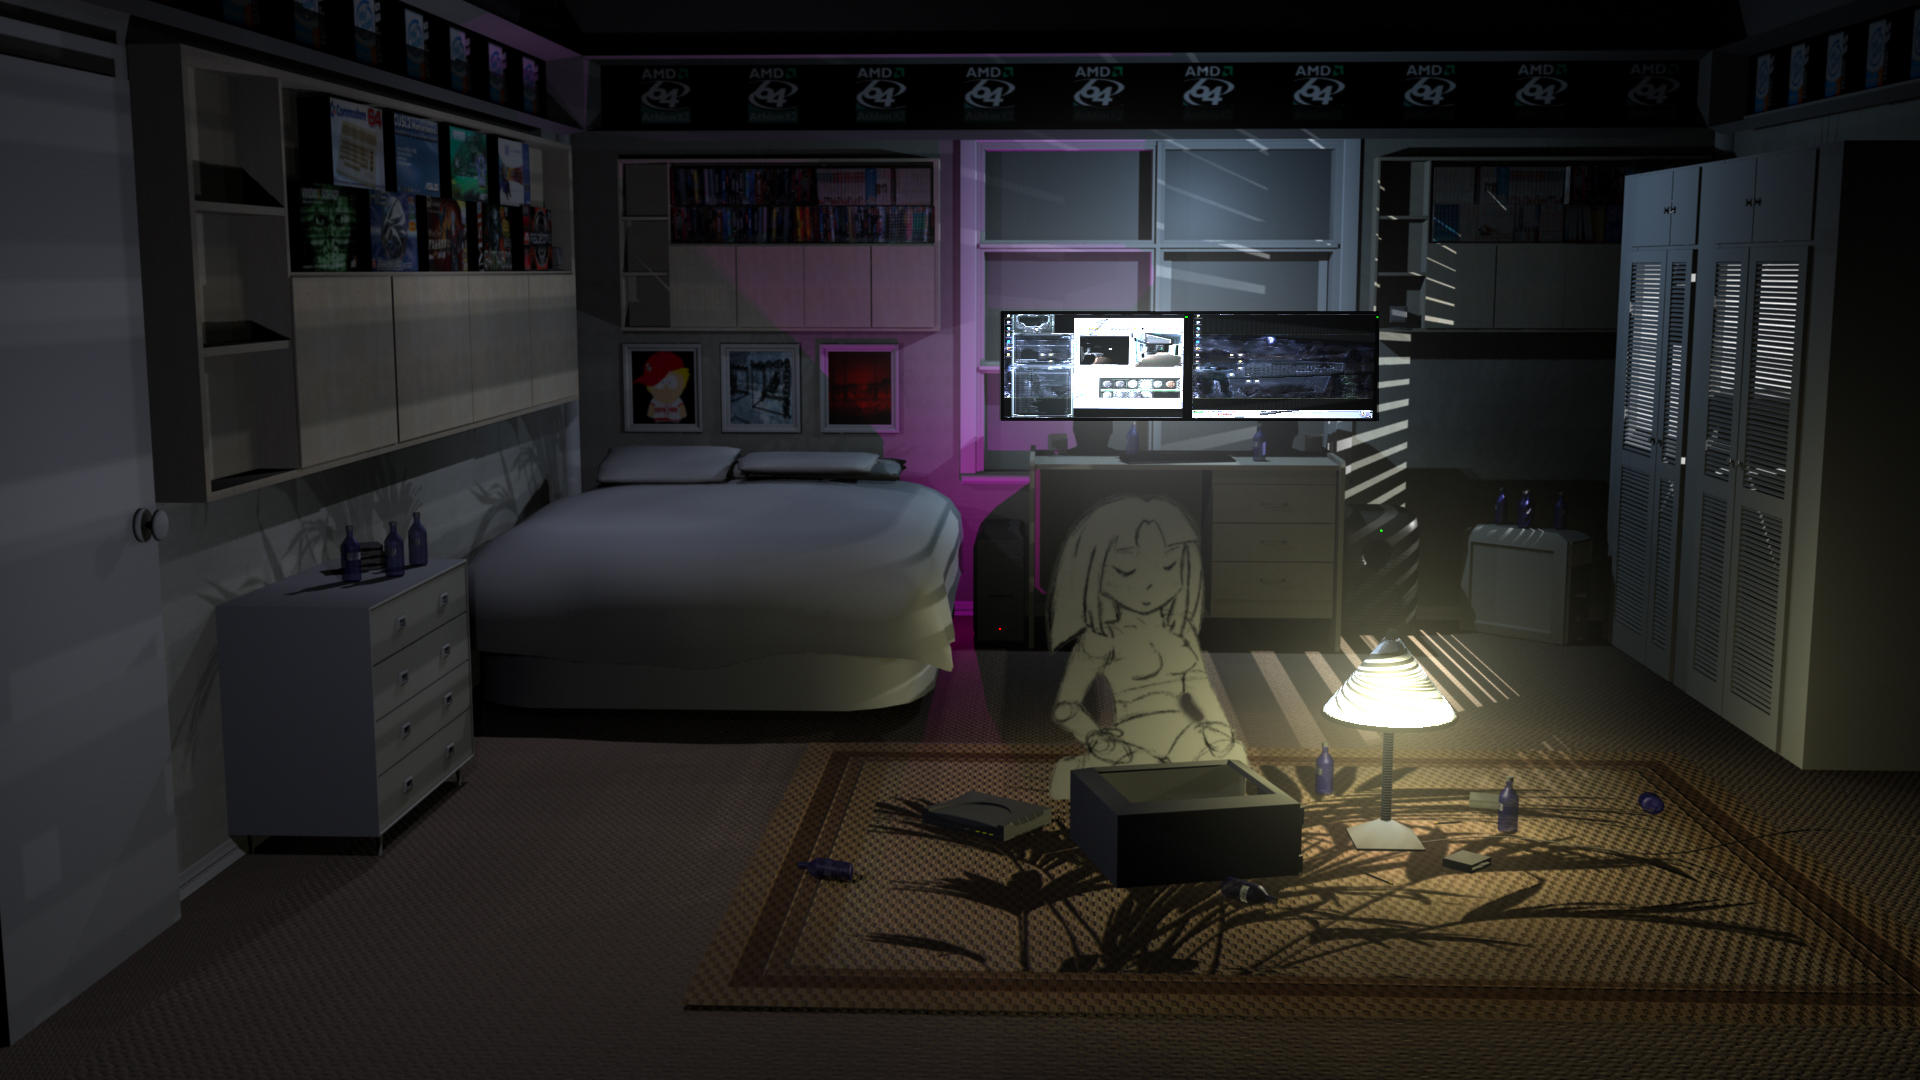 Nerd Girl Room By Masterlatvia On Deviantart